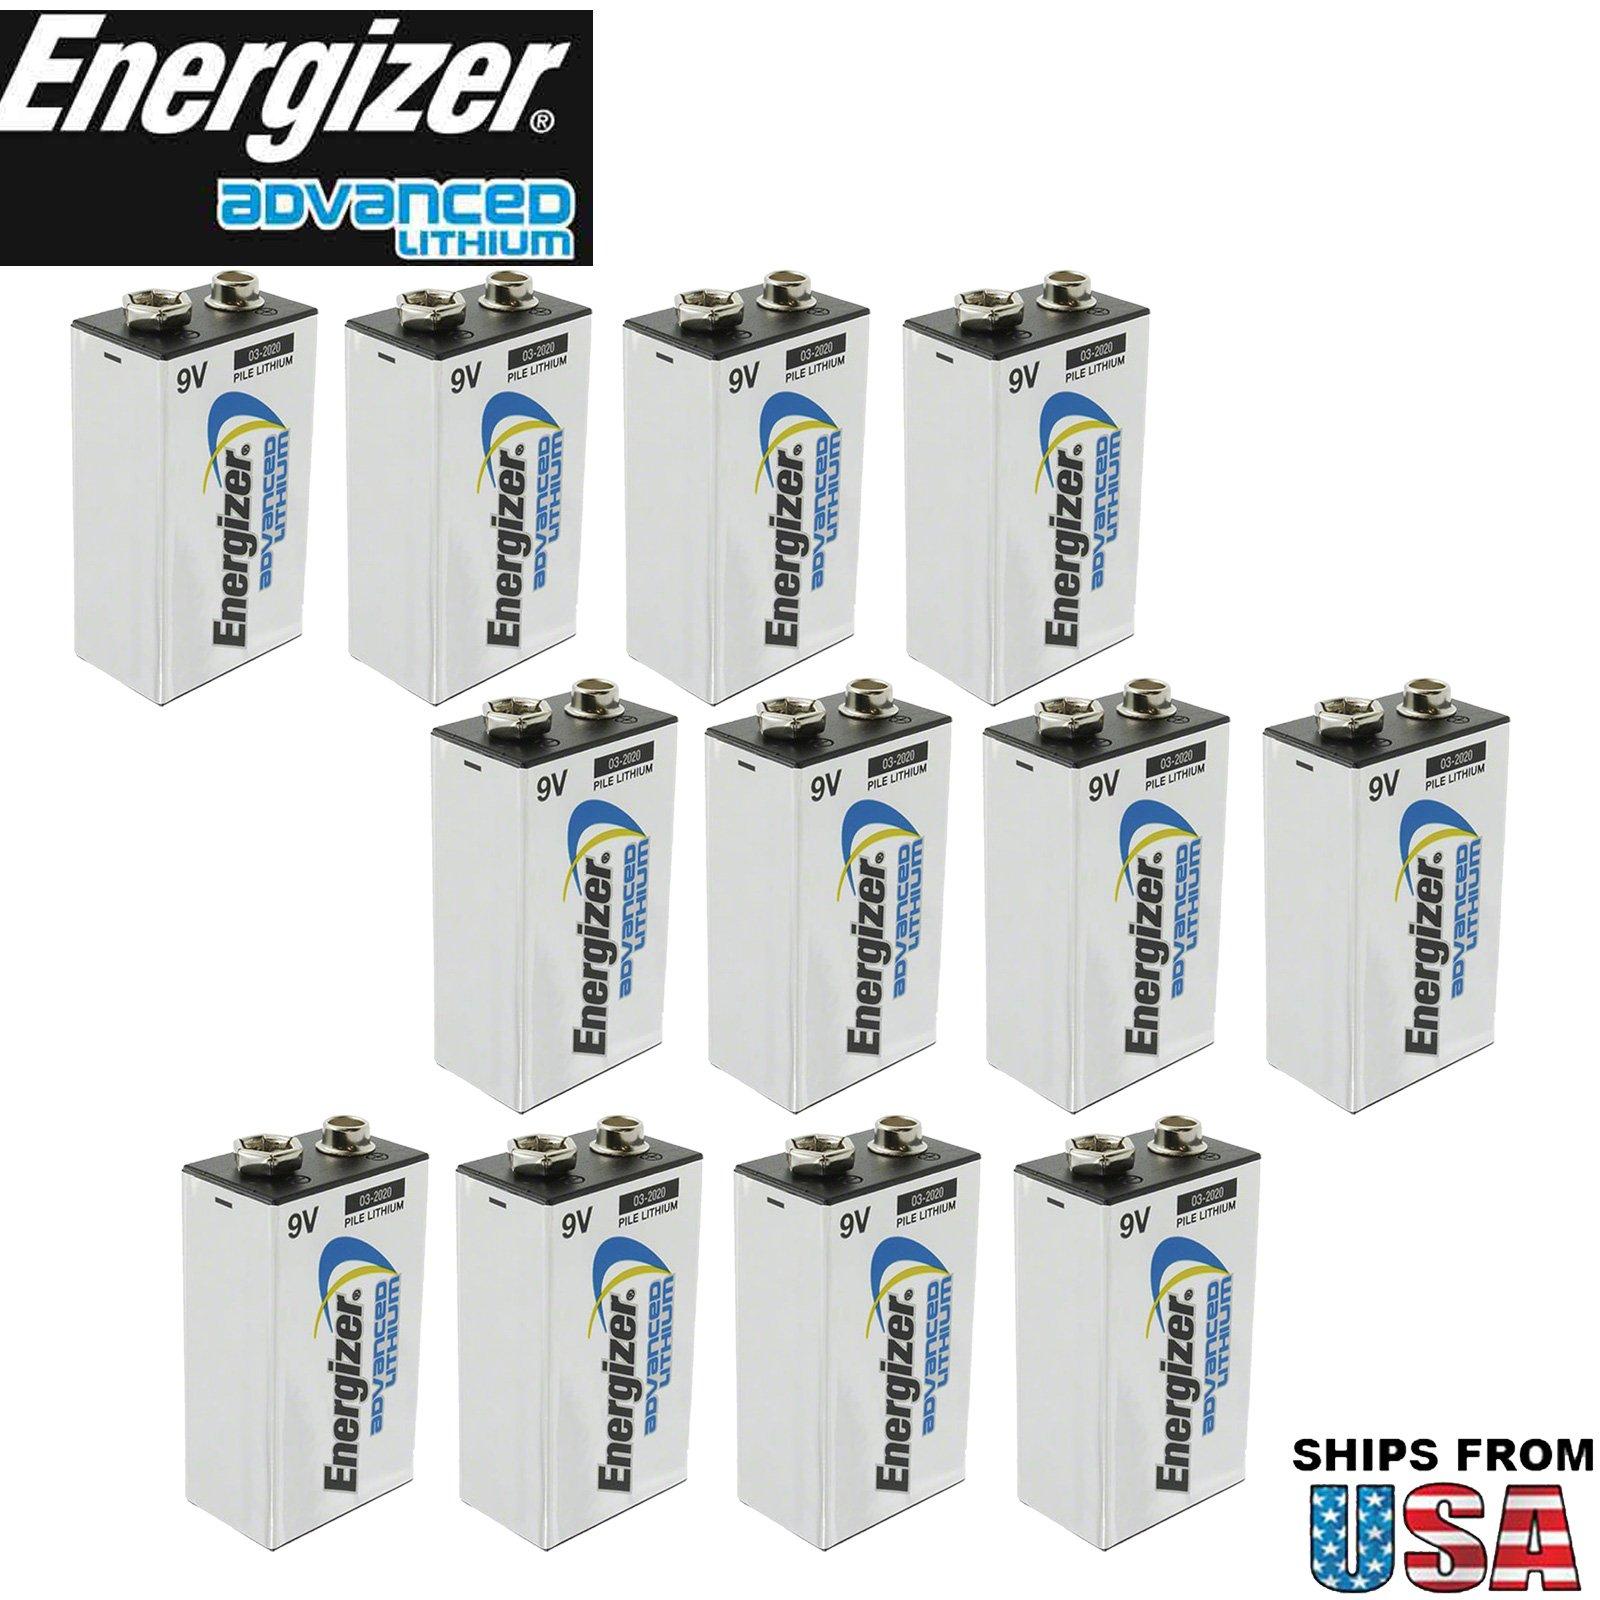 Charmant Amazon.com: Energizer 12pk 9V Advanced Lithium Batteries LA522 Bulk: Health  U0026 Personal Care